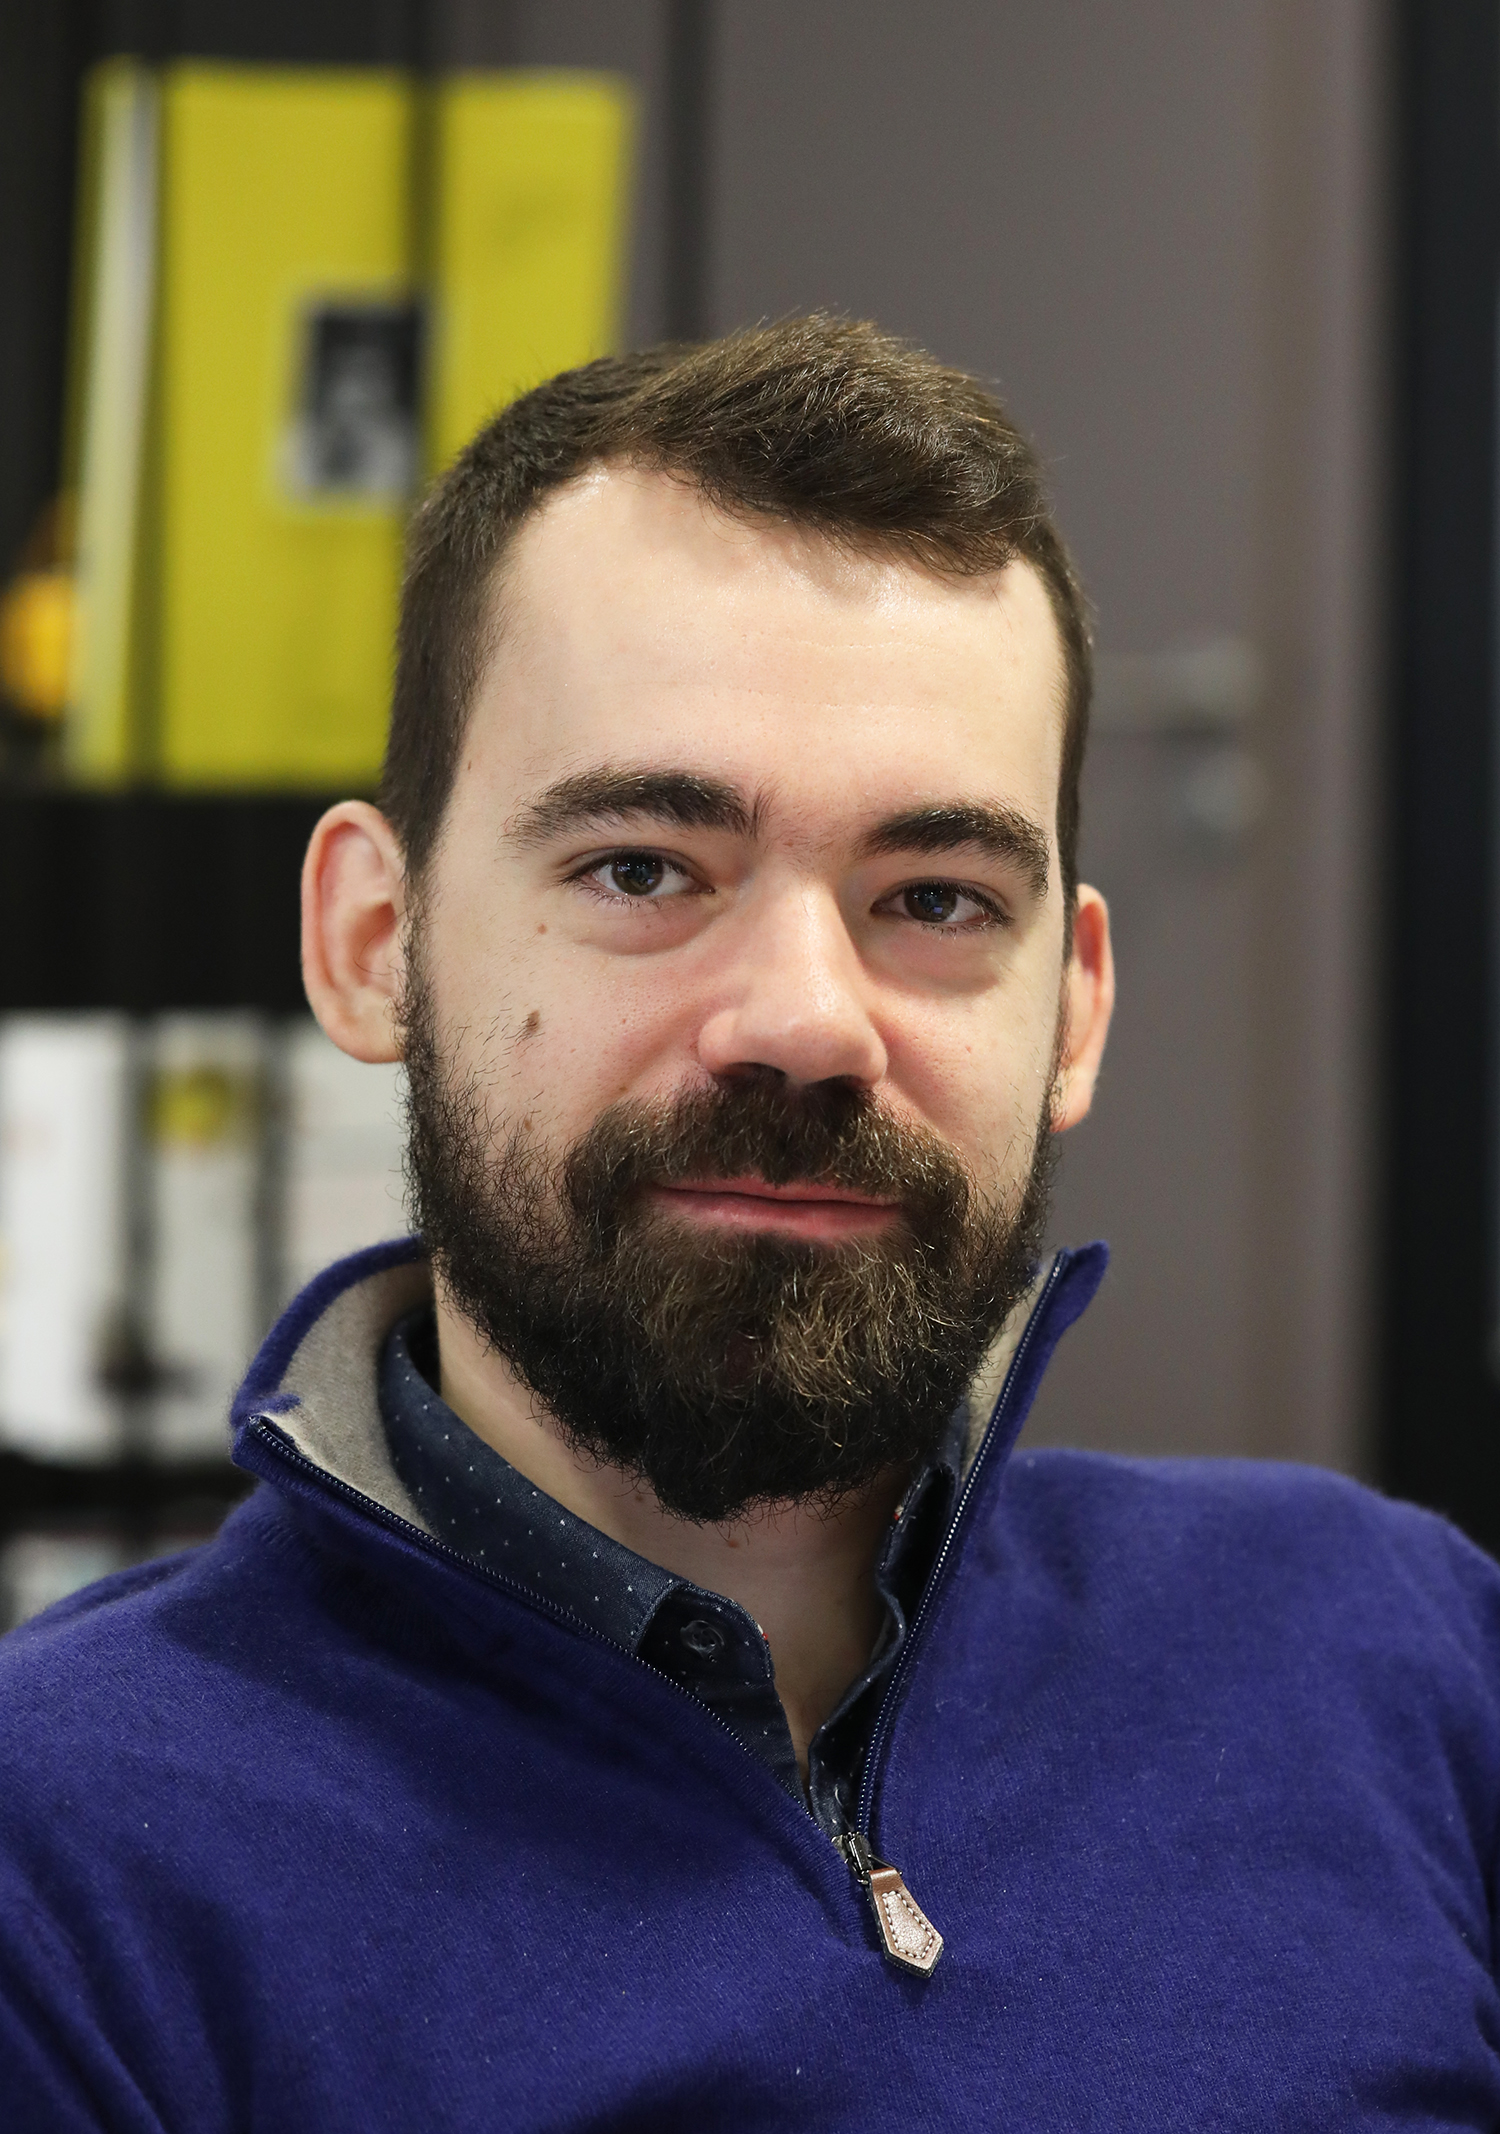 Paul Niocel